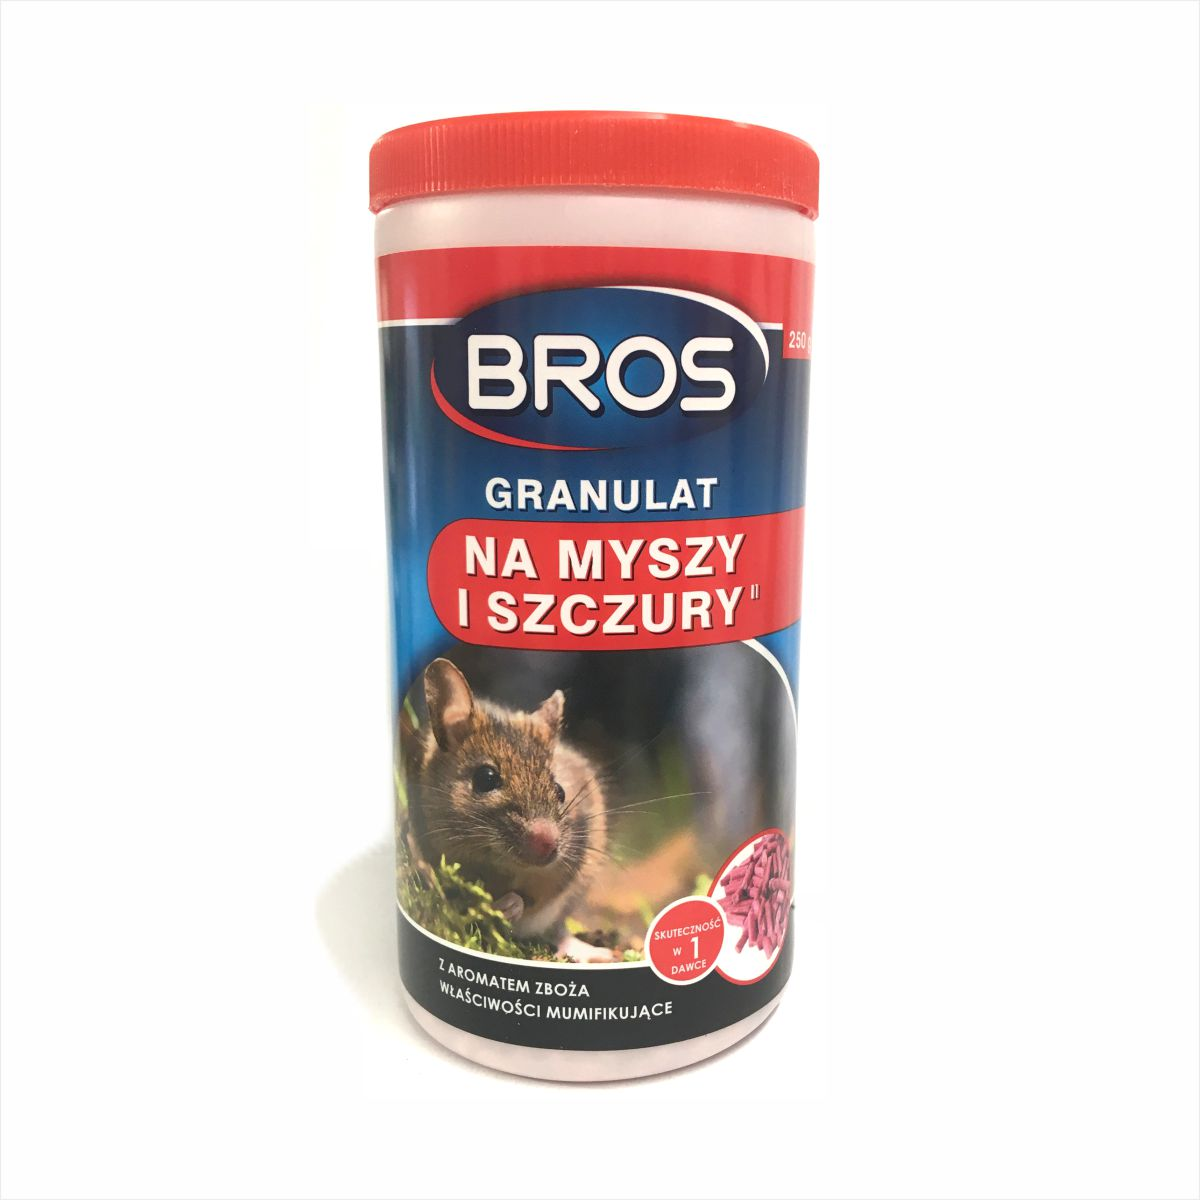 Granulat na myszy i szczury 250 g Bros